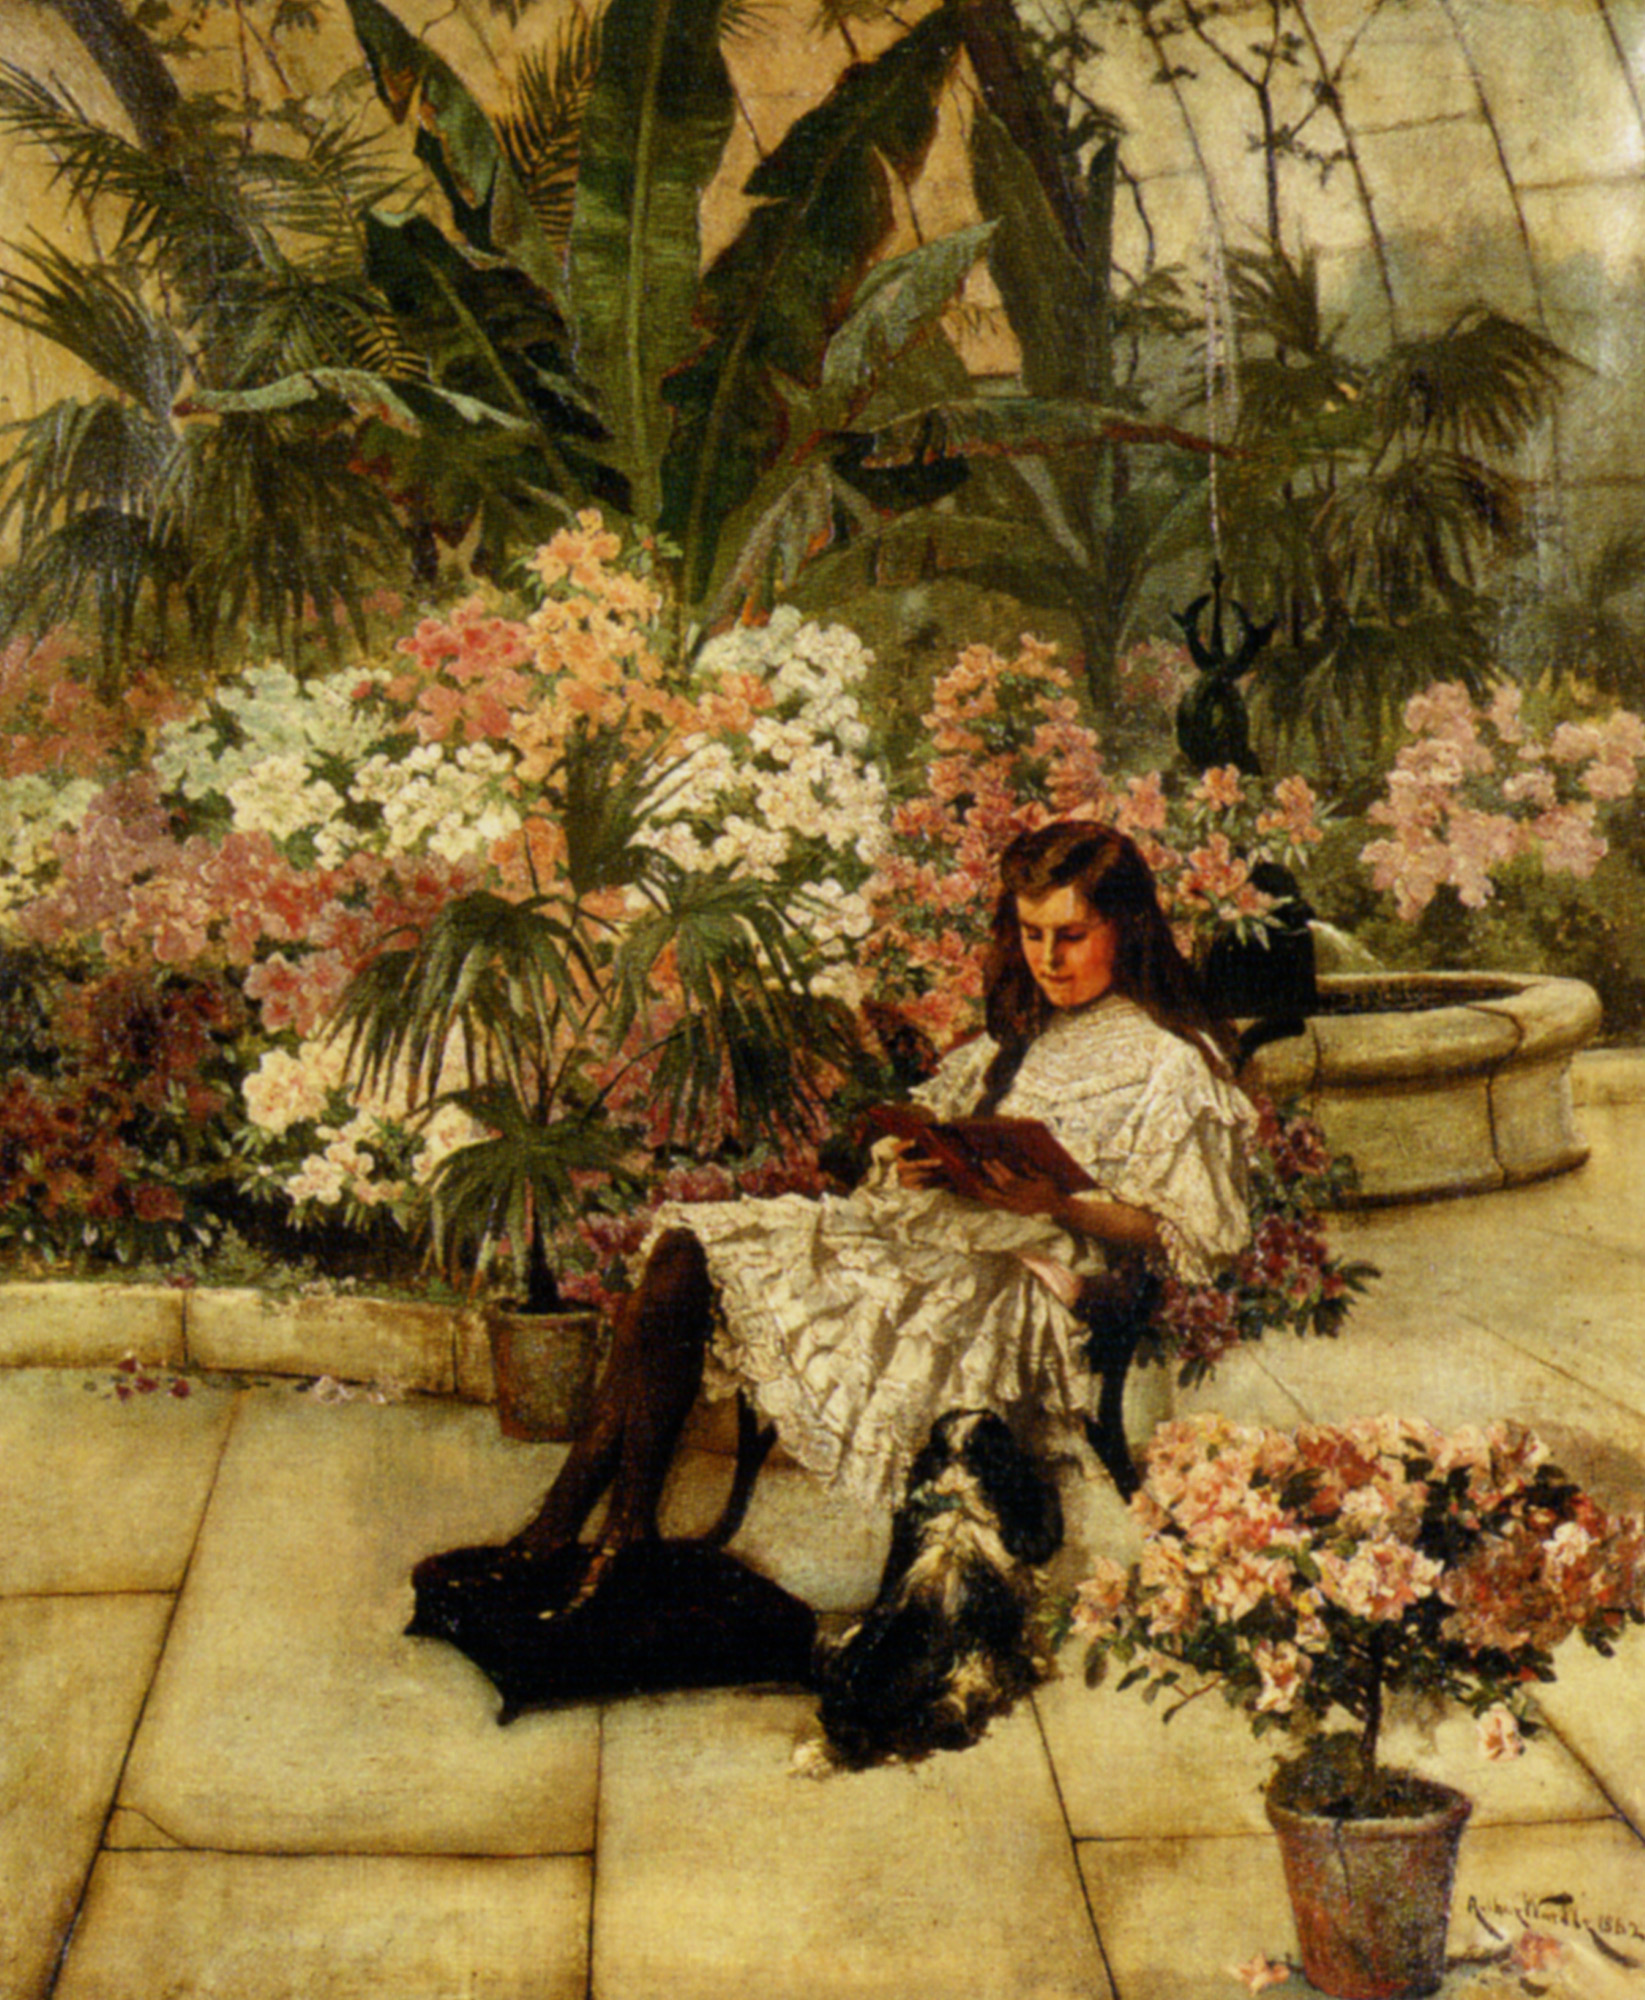 In The Conservatory :: Arthur Wardle - Summer landscapes and gardens ôîòî